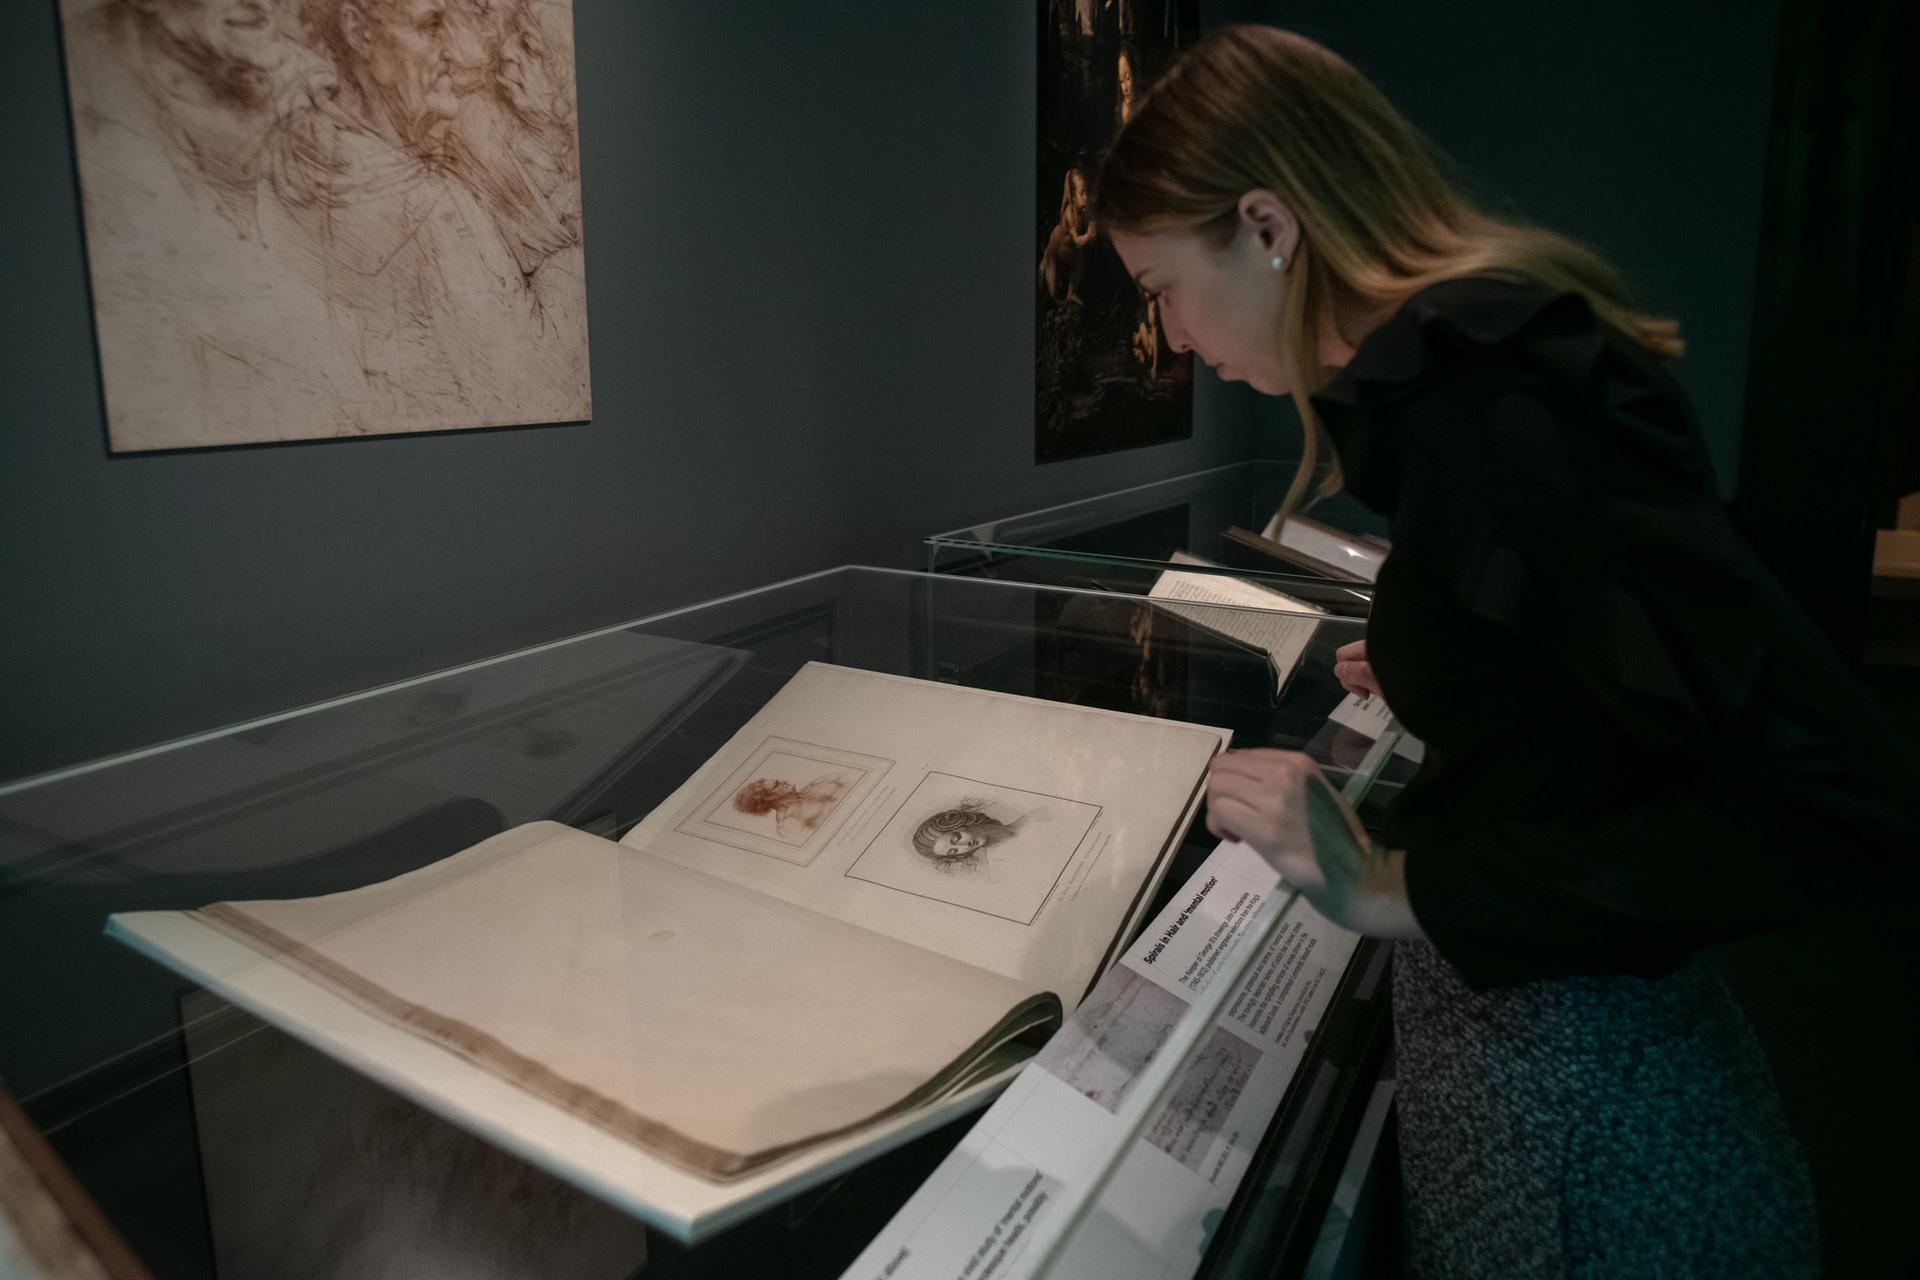 Leonardo-da-Vinci-A-Mind-in-Motion-at-the-British-Library-2